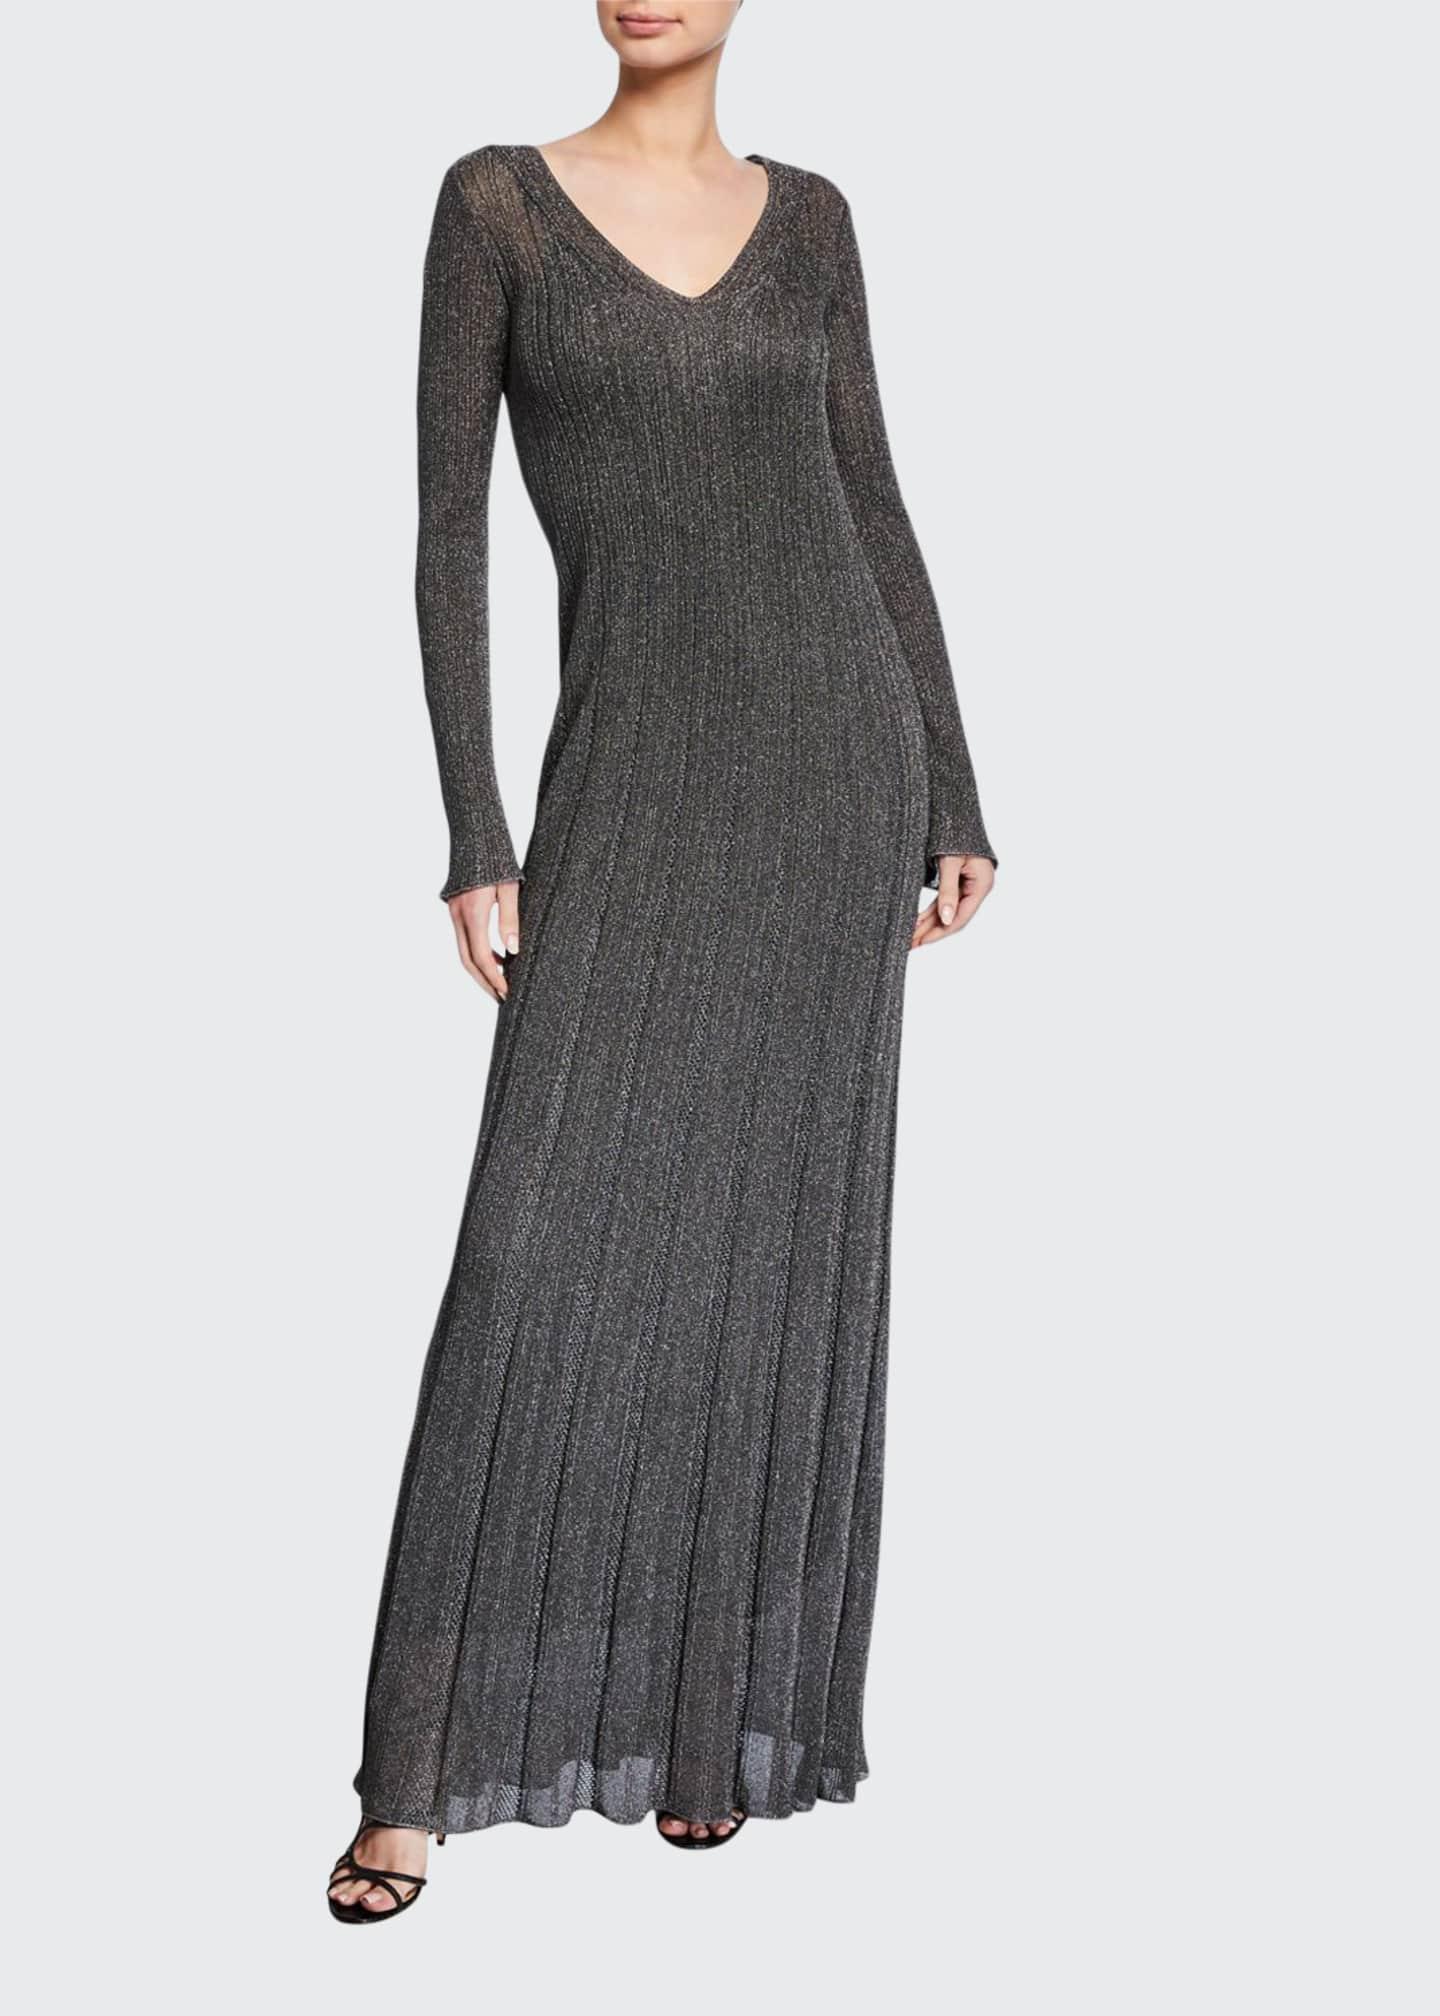 M Missoni Unito Metallic V-Neck Long-Sleeve Dress